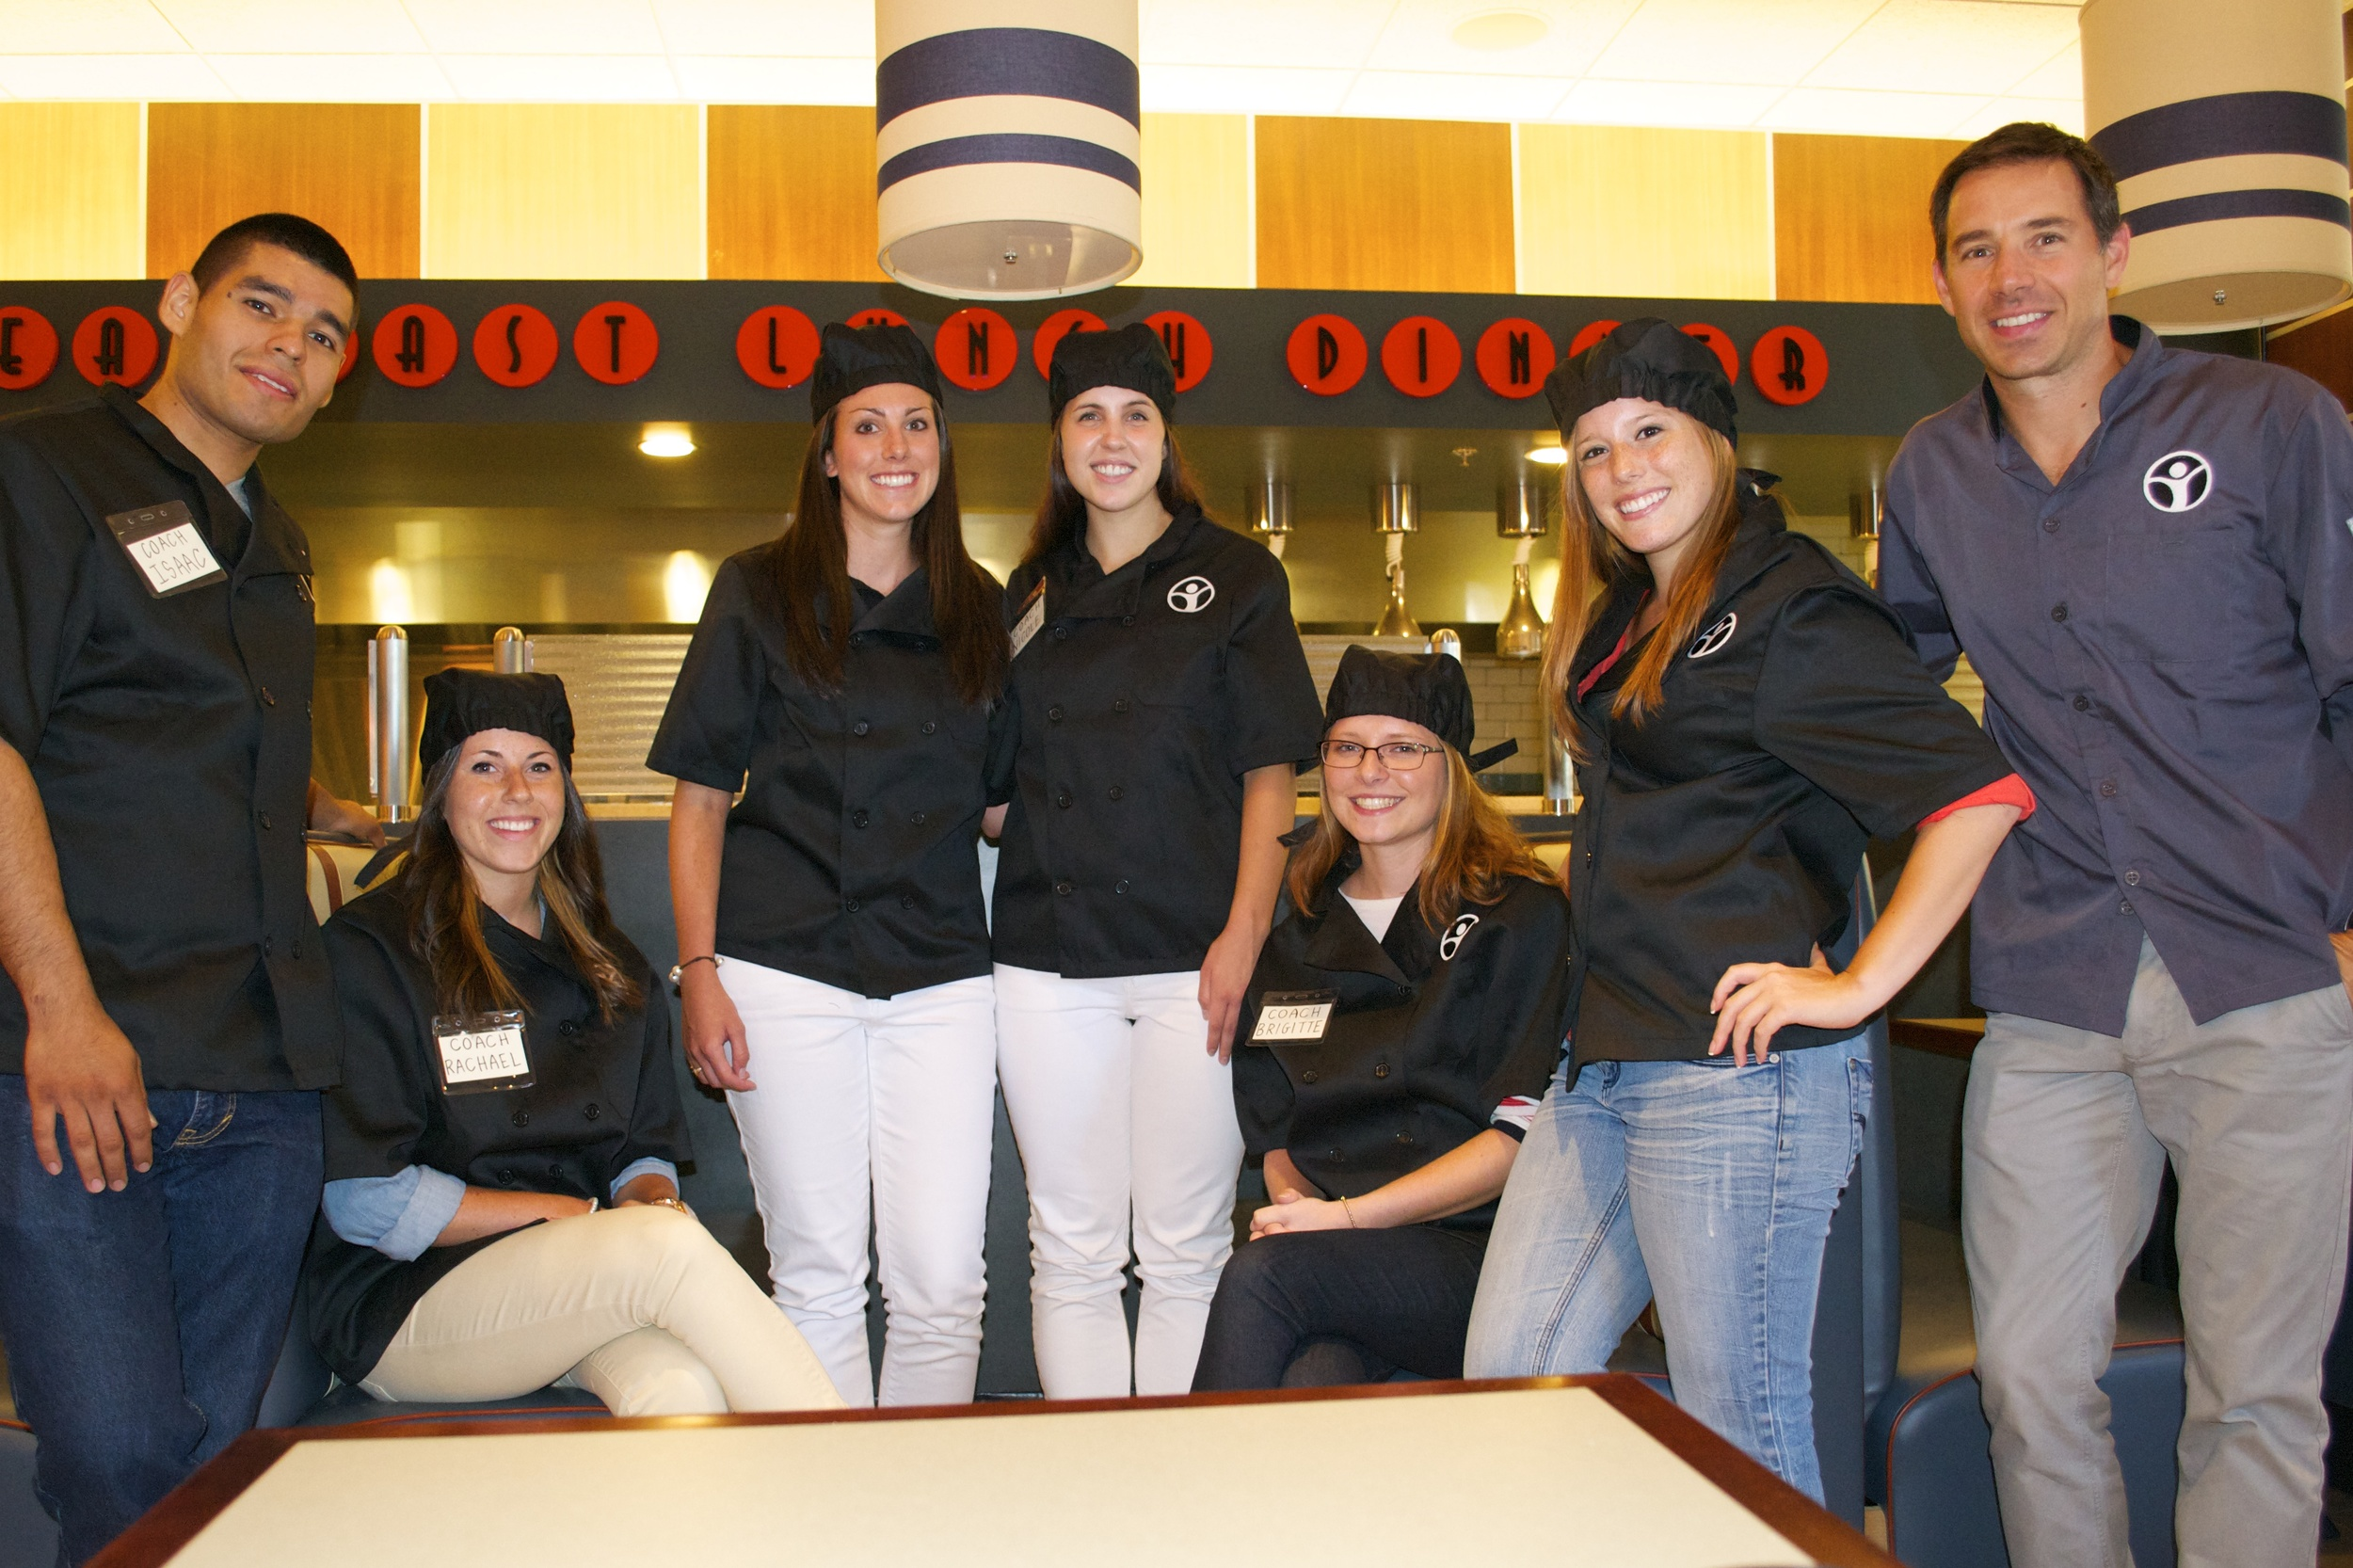 Restaurant Camp staff: (Left to right) Isaac, Rachael, Erika, Nicole, Brigitte, Holly and Ryan.